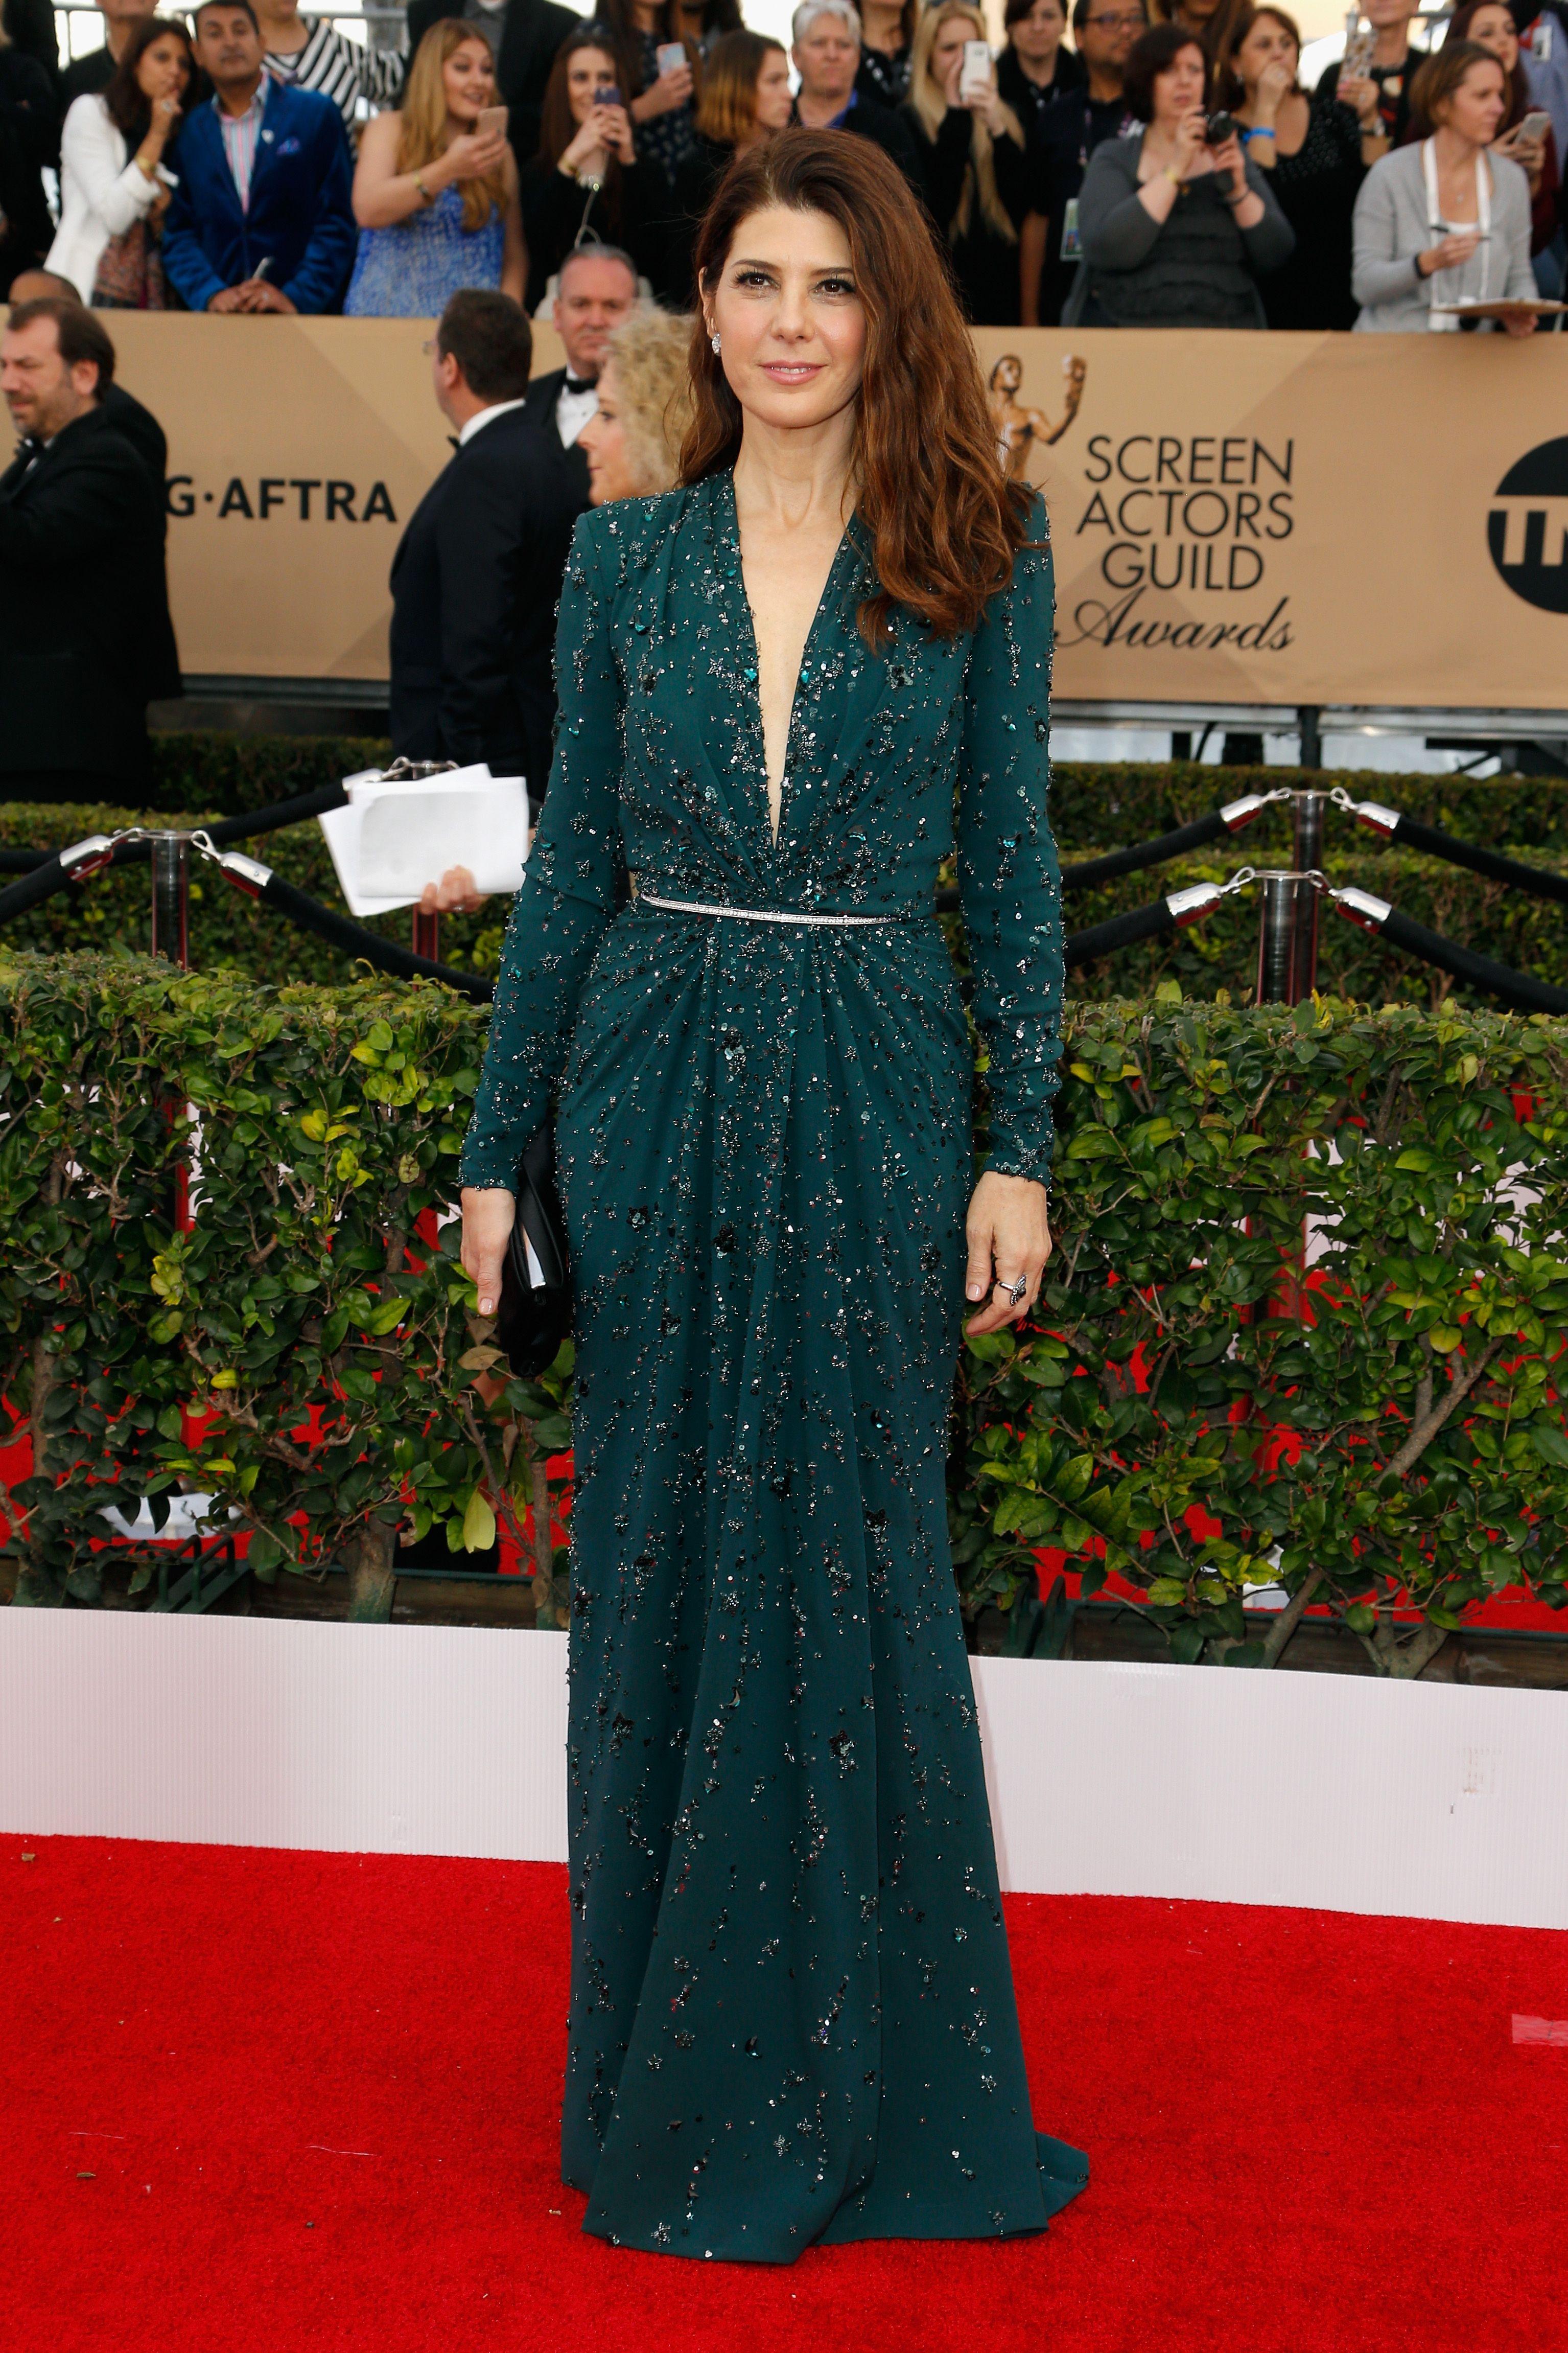 Sag Awards Red Carpet Fashion 2017 Screen Actors Guild Photos